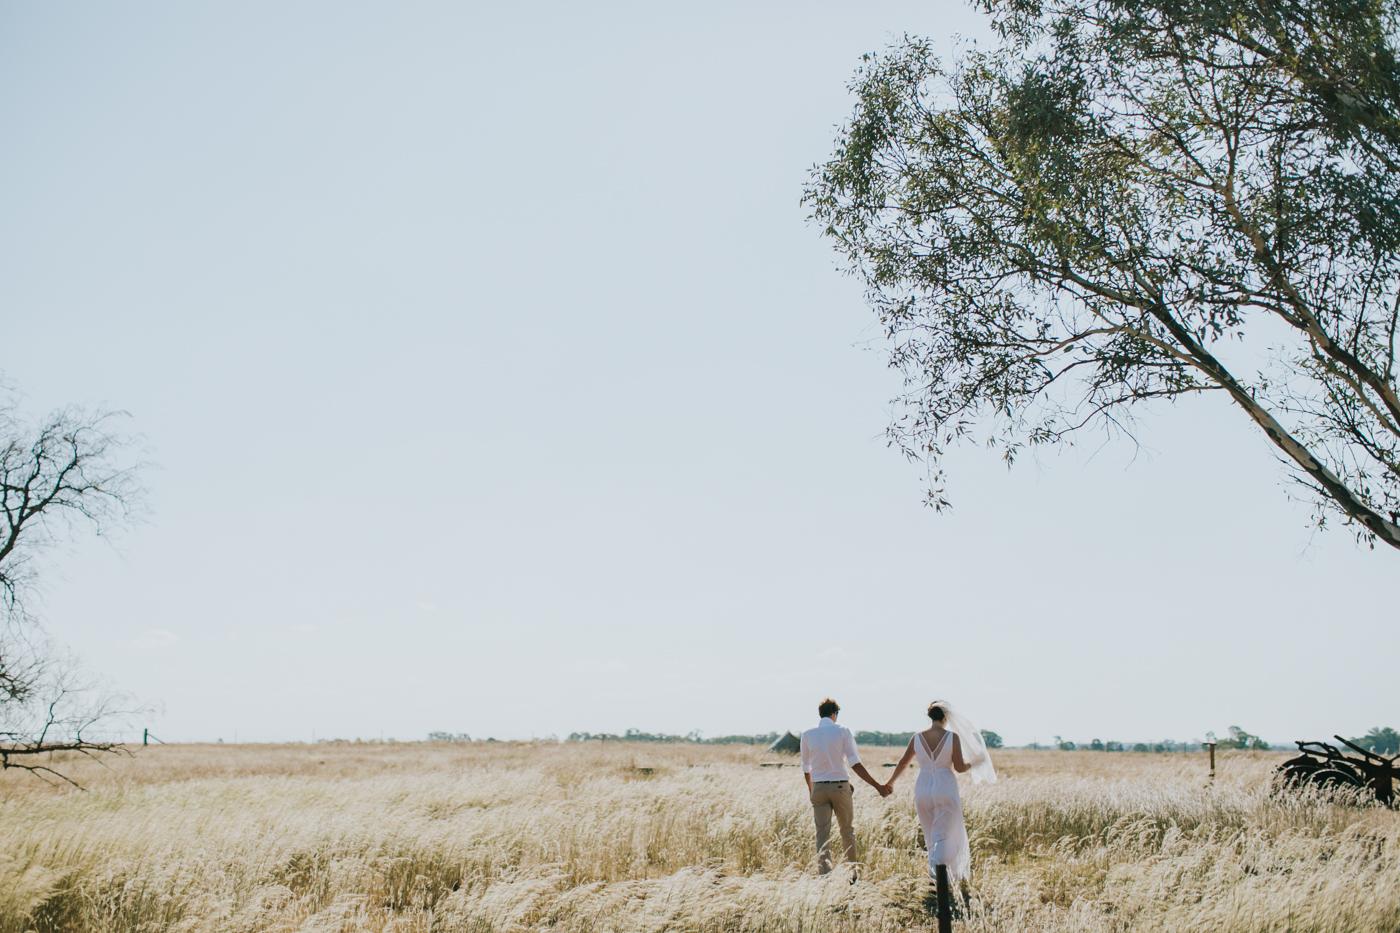 Nicolle & Jacob - Dubbo Wedding - Country Australia - Samantha Heather Photography-158.jpg